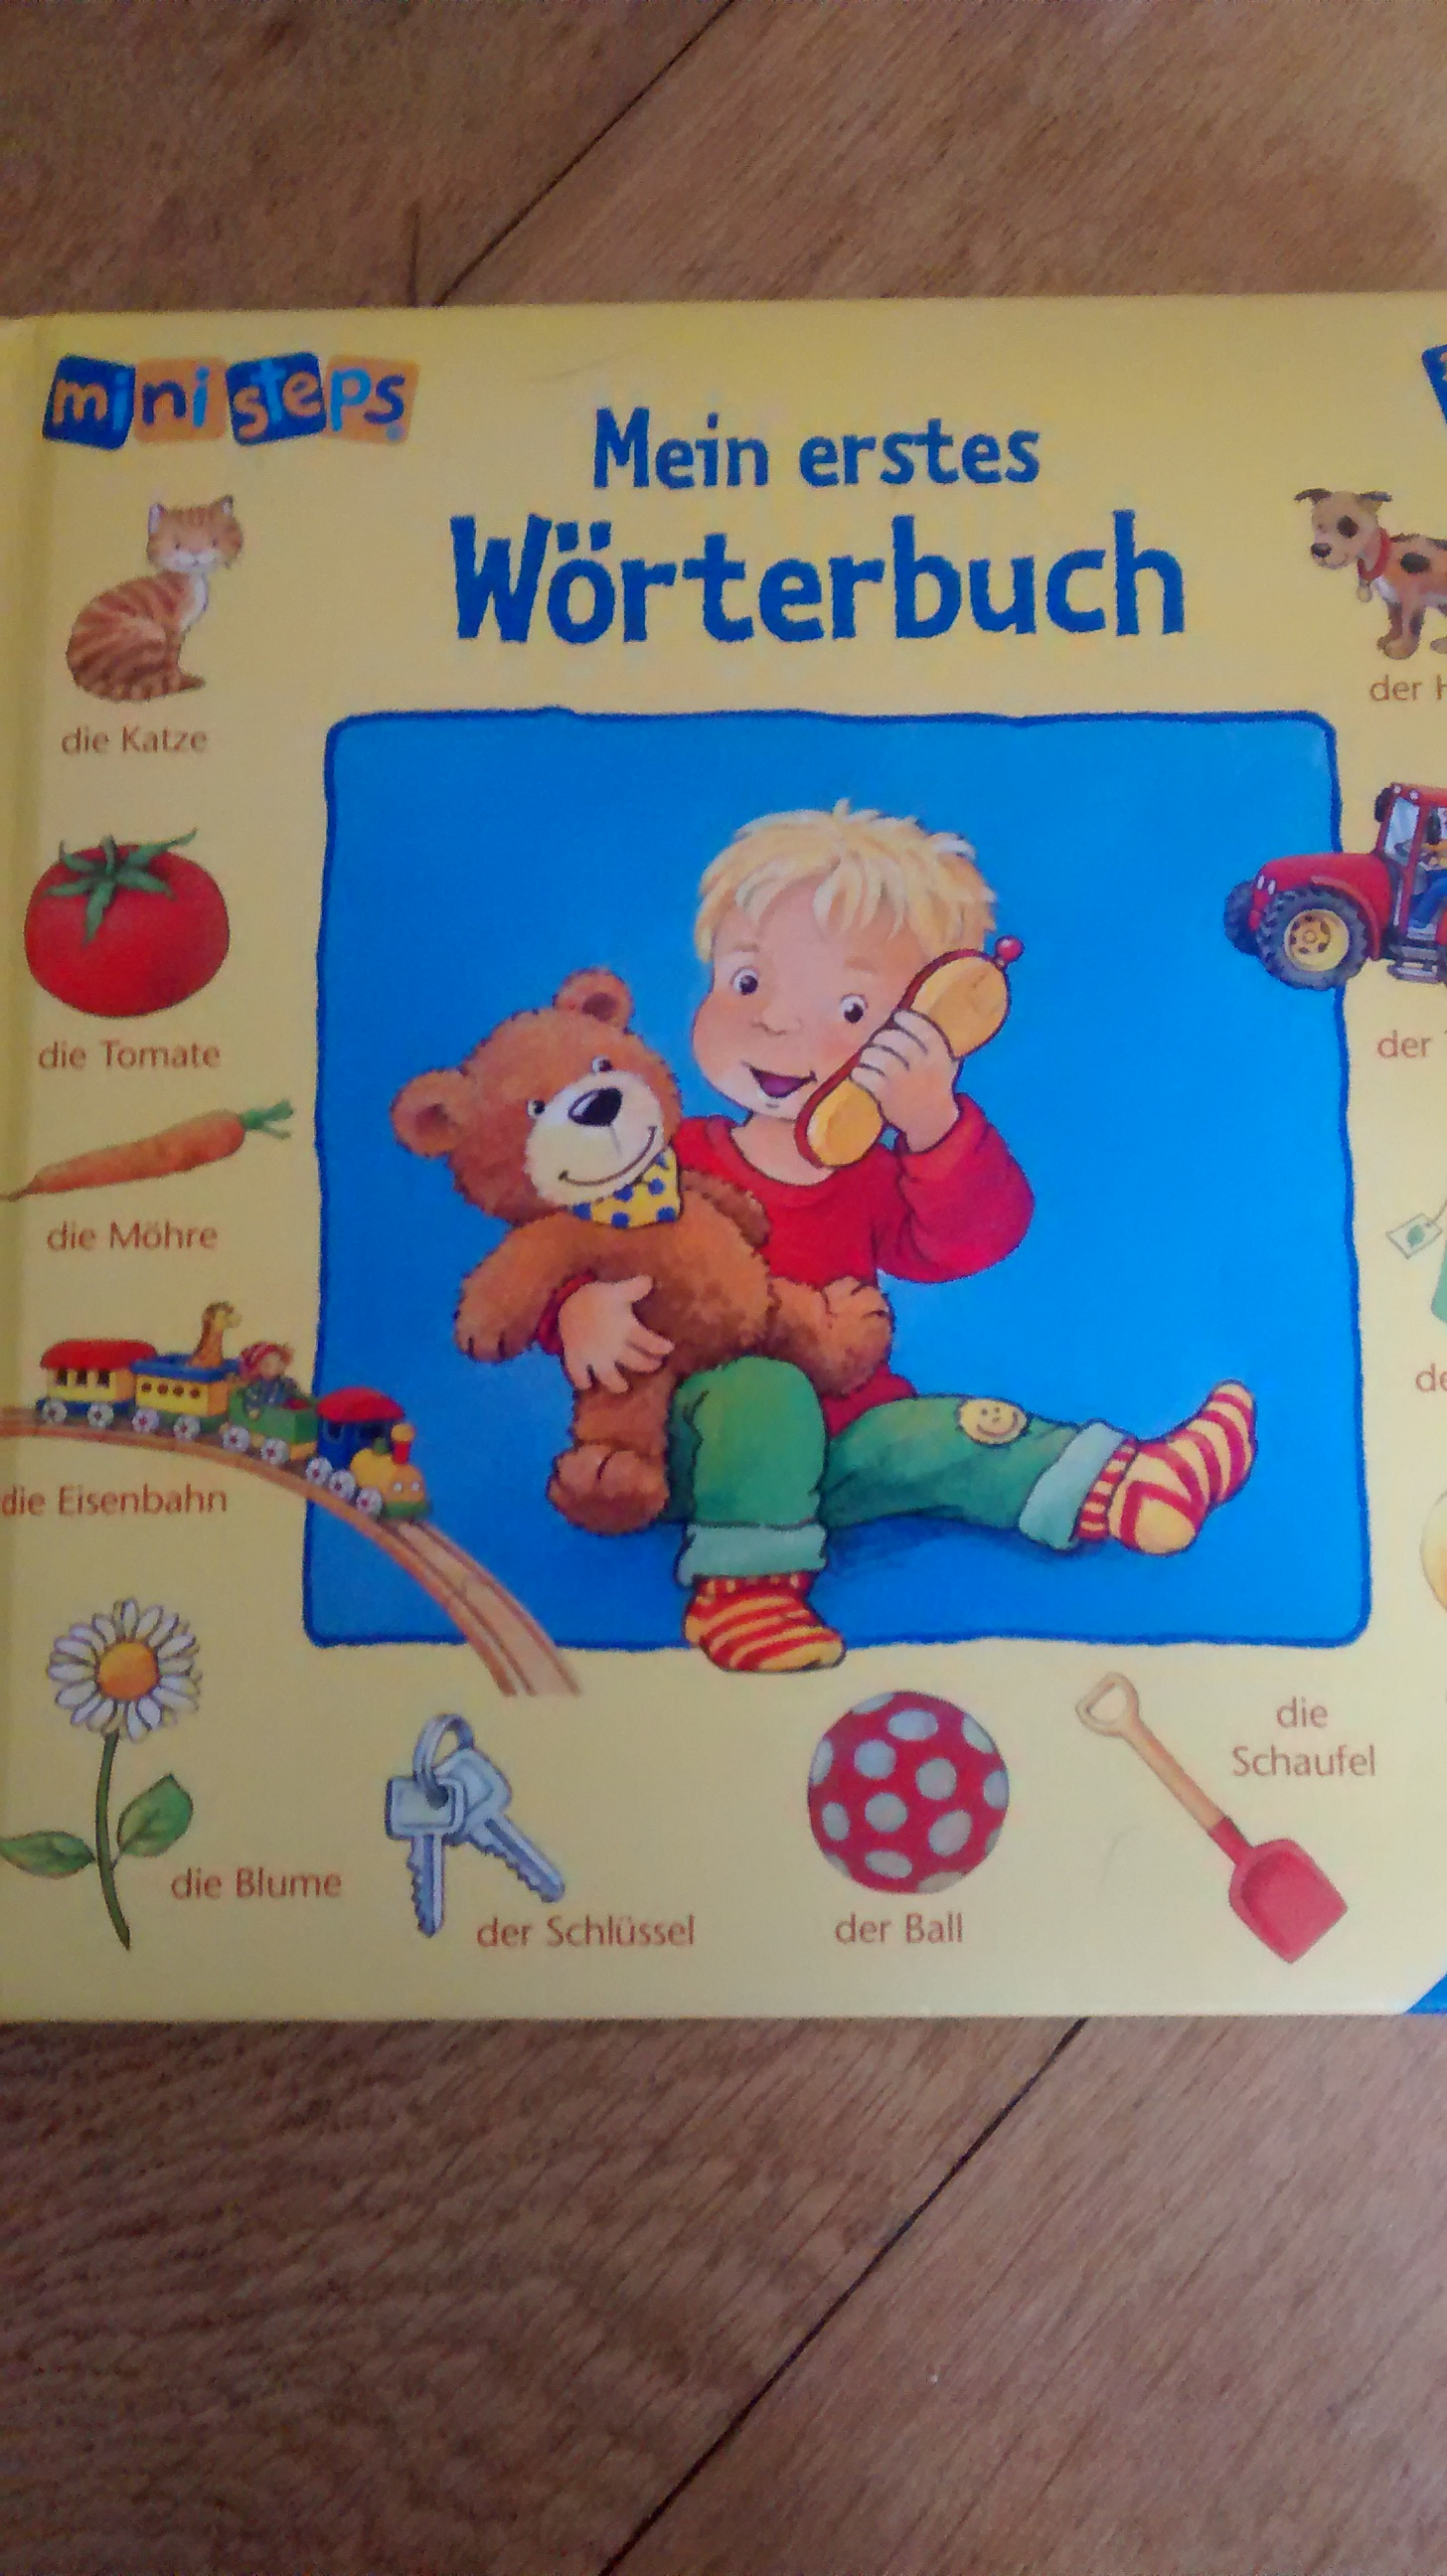 Sense Organics Blog zeigt Kinderbücher